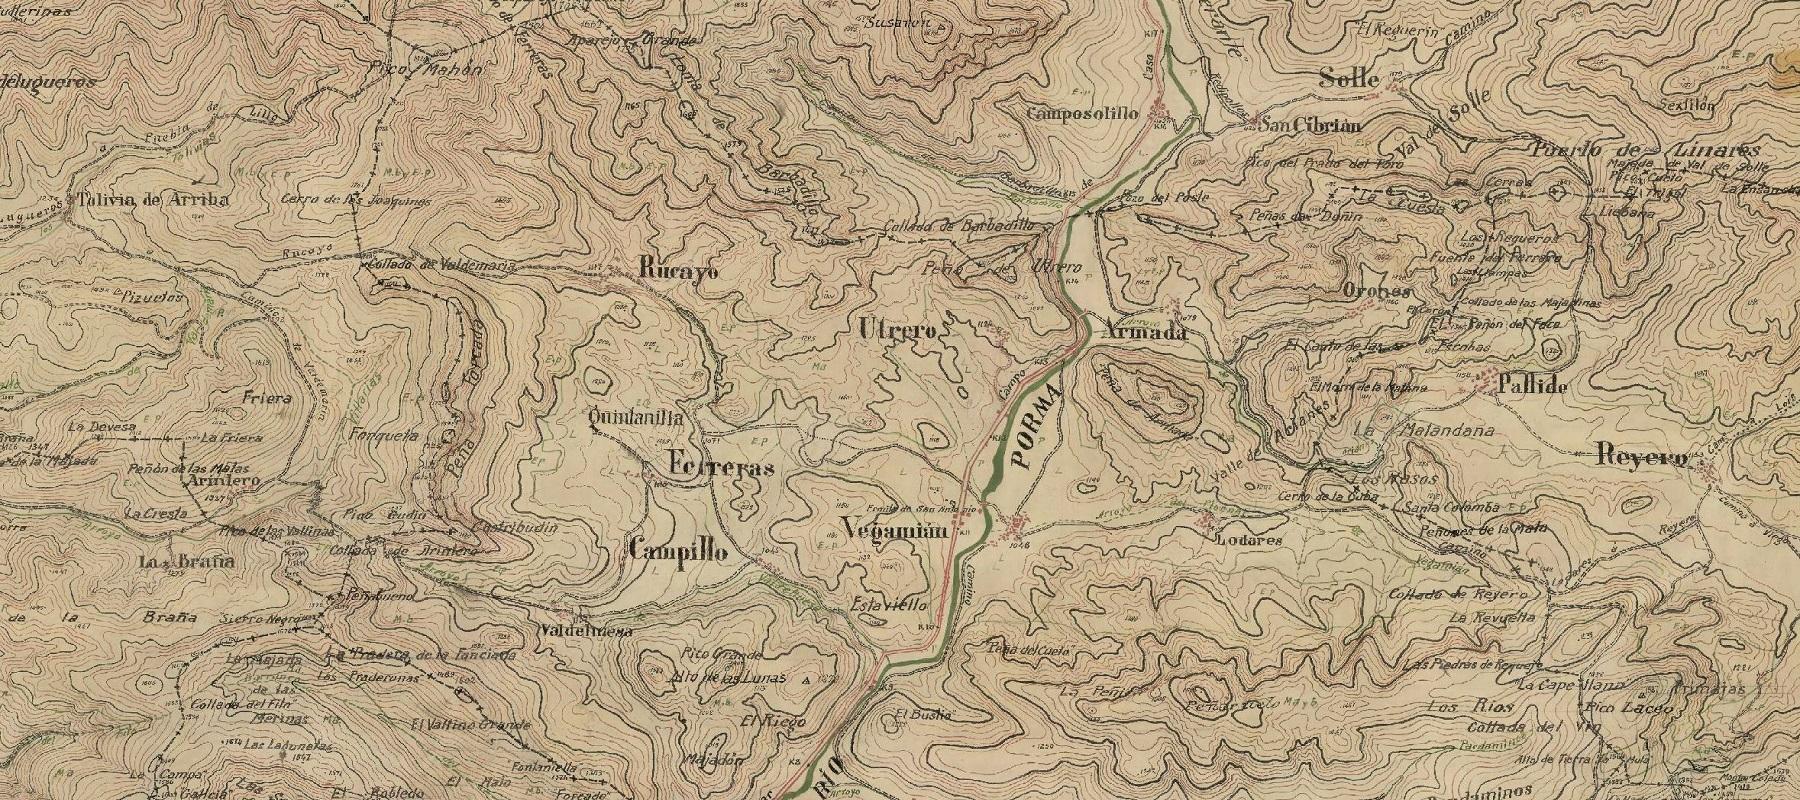 Mapa embalse del Porma 1915-1960